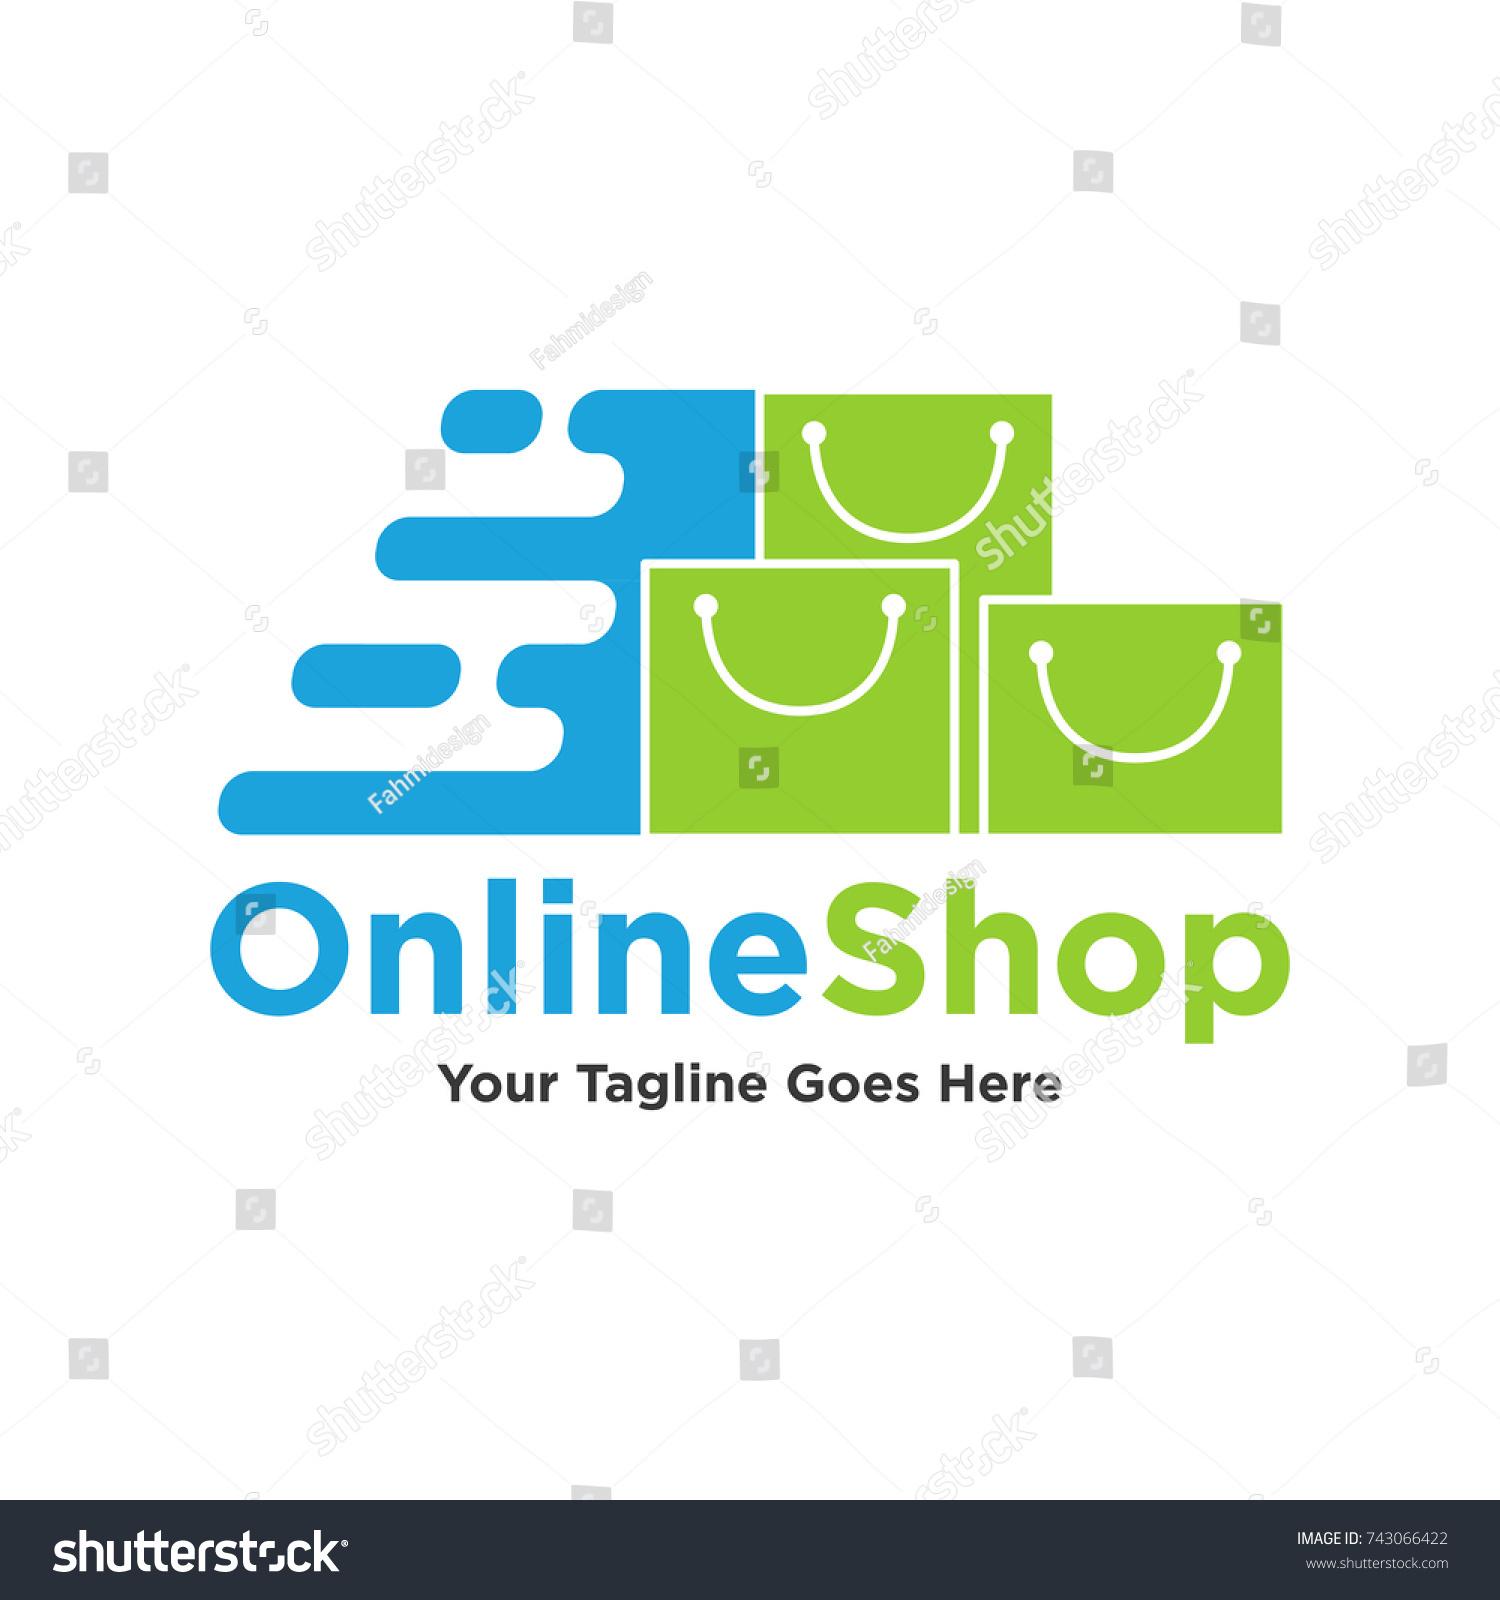 Online Shop Logo Design Vector Online Stock Vector Royalty Free